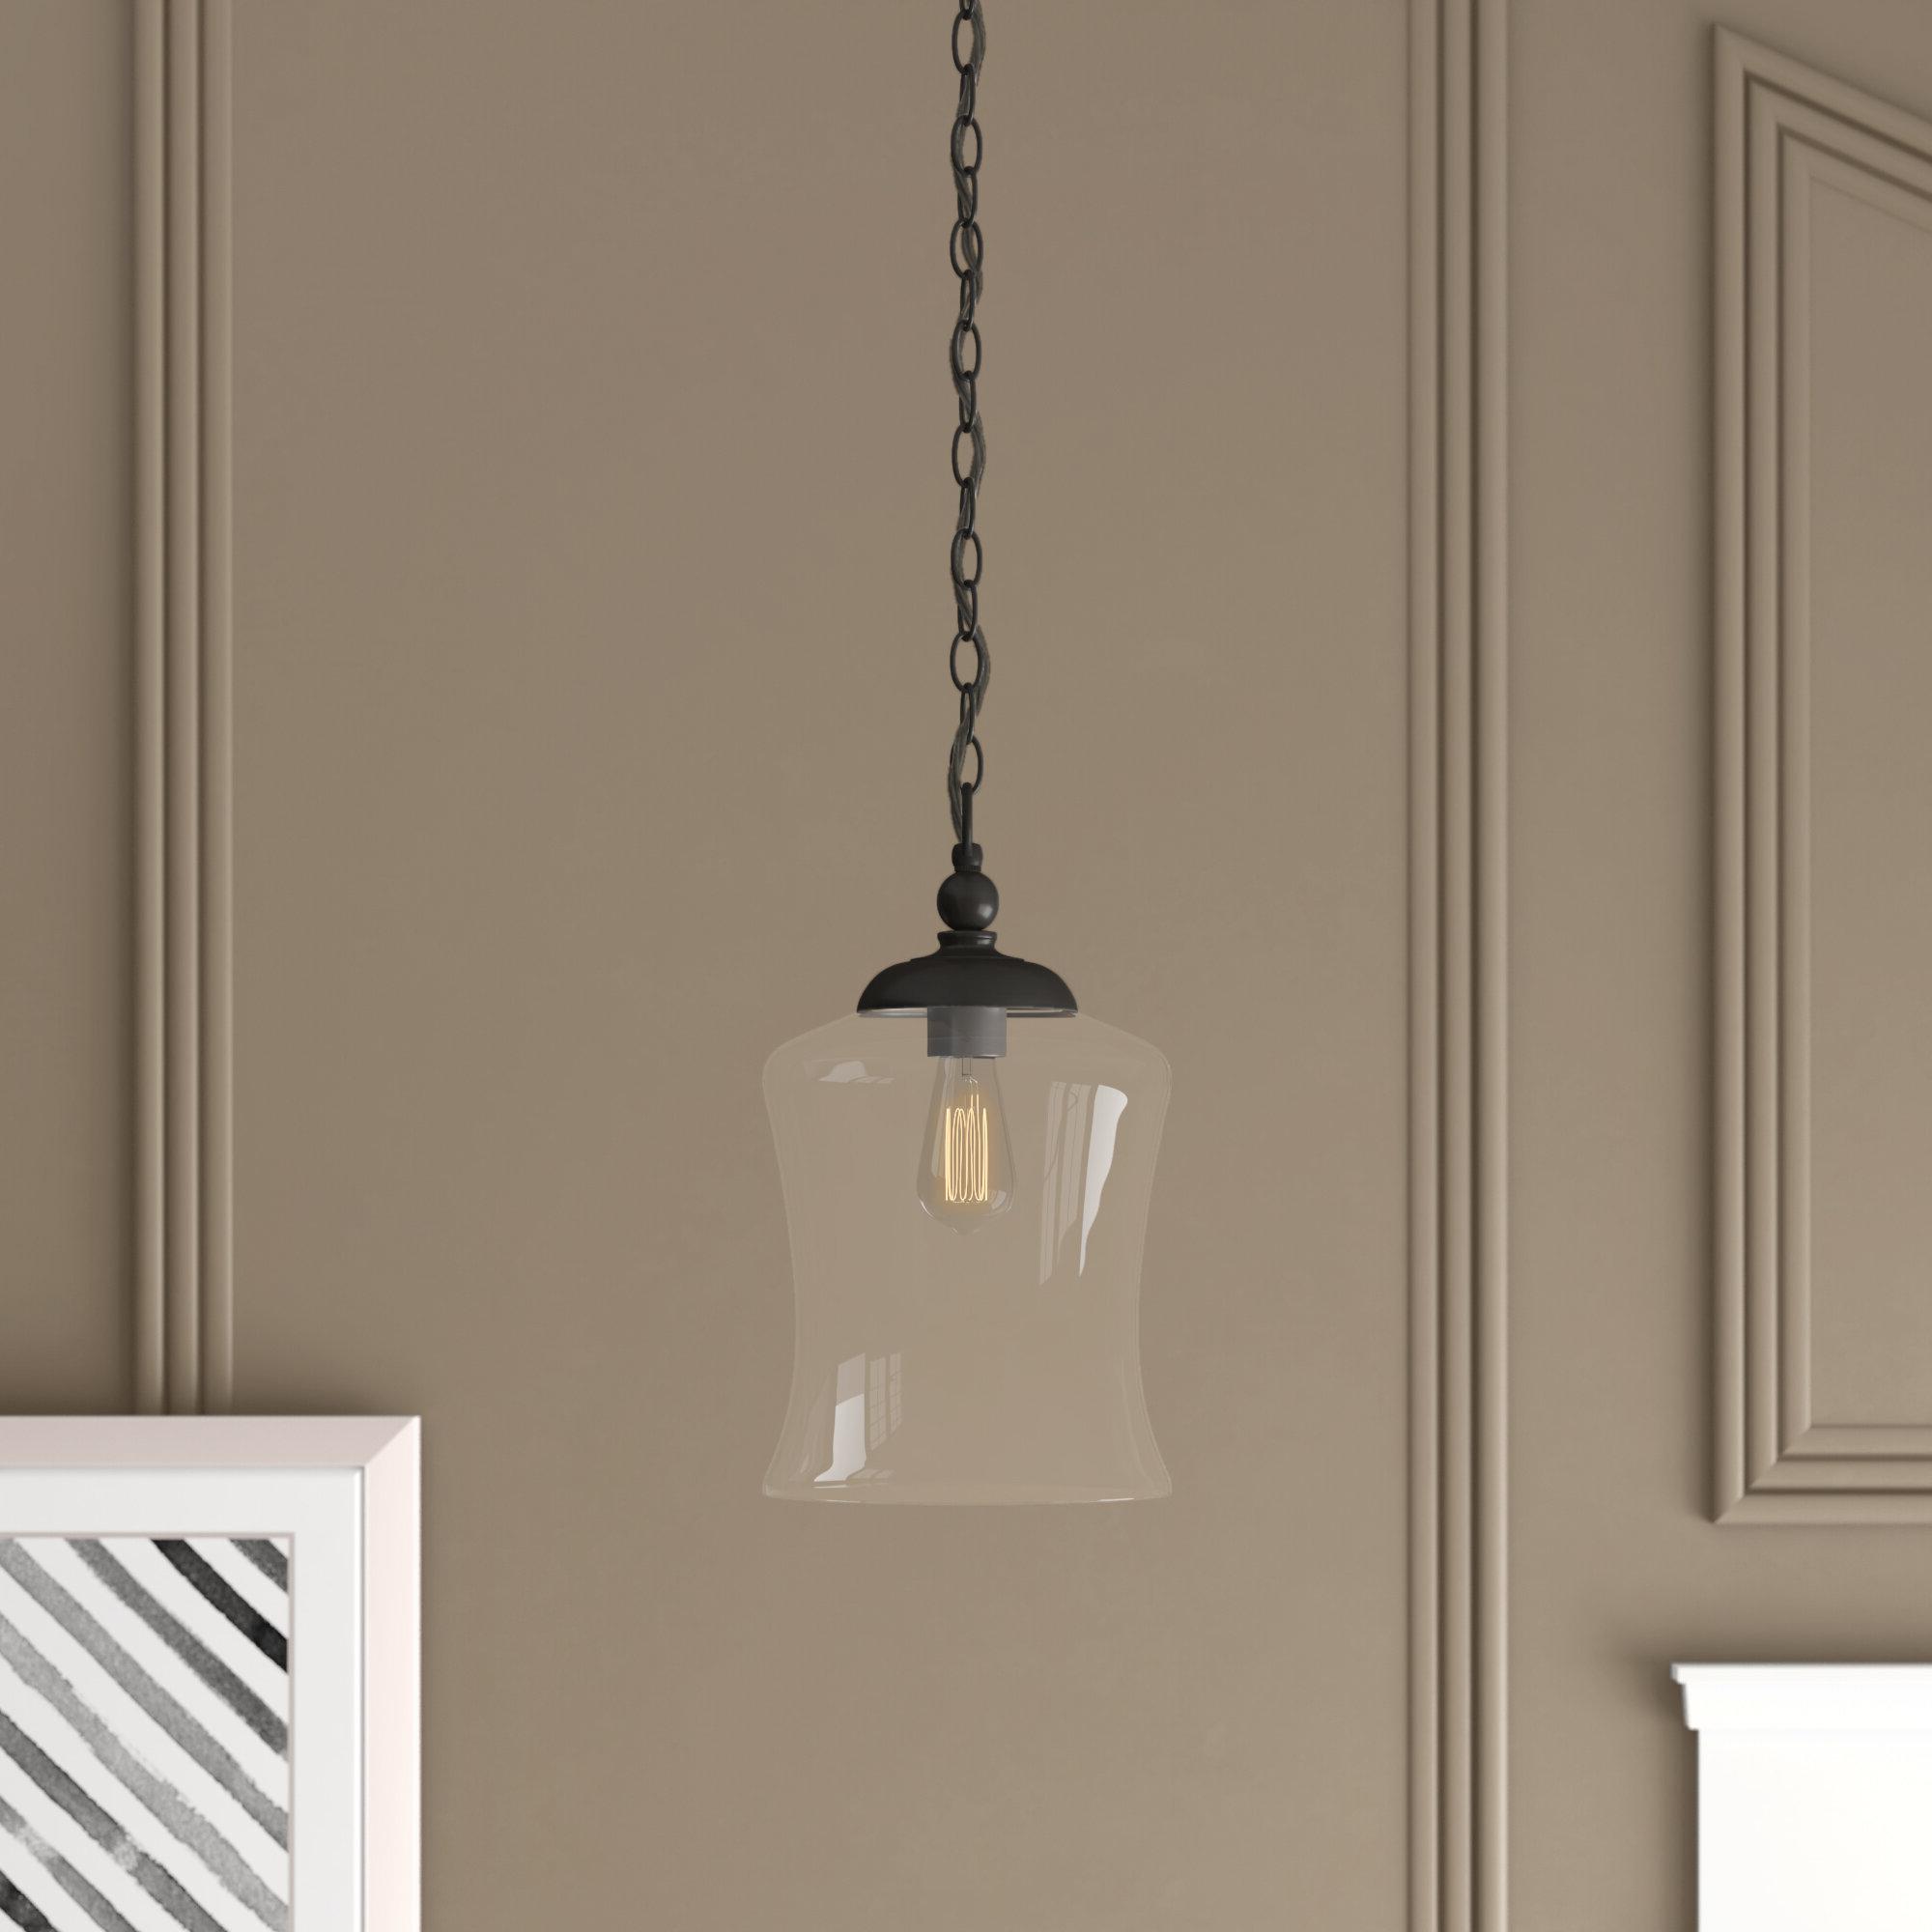 Wentzville 1 Light Single Bell Pendant With Regard To Famous Nolan 1 Light Single Cylinder Pendants (View 5 of 20)